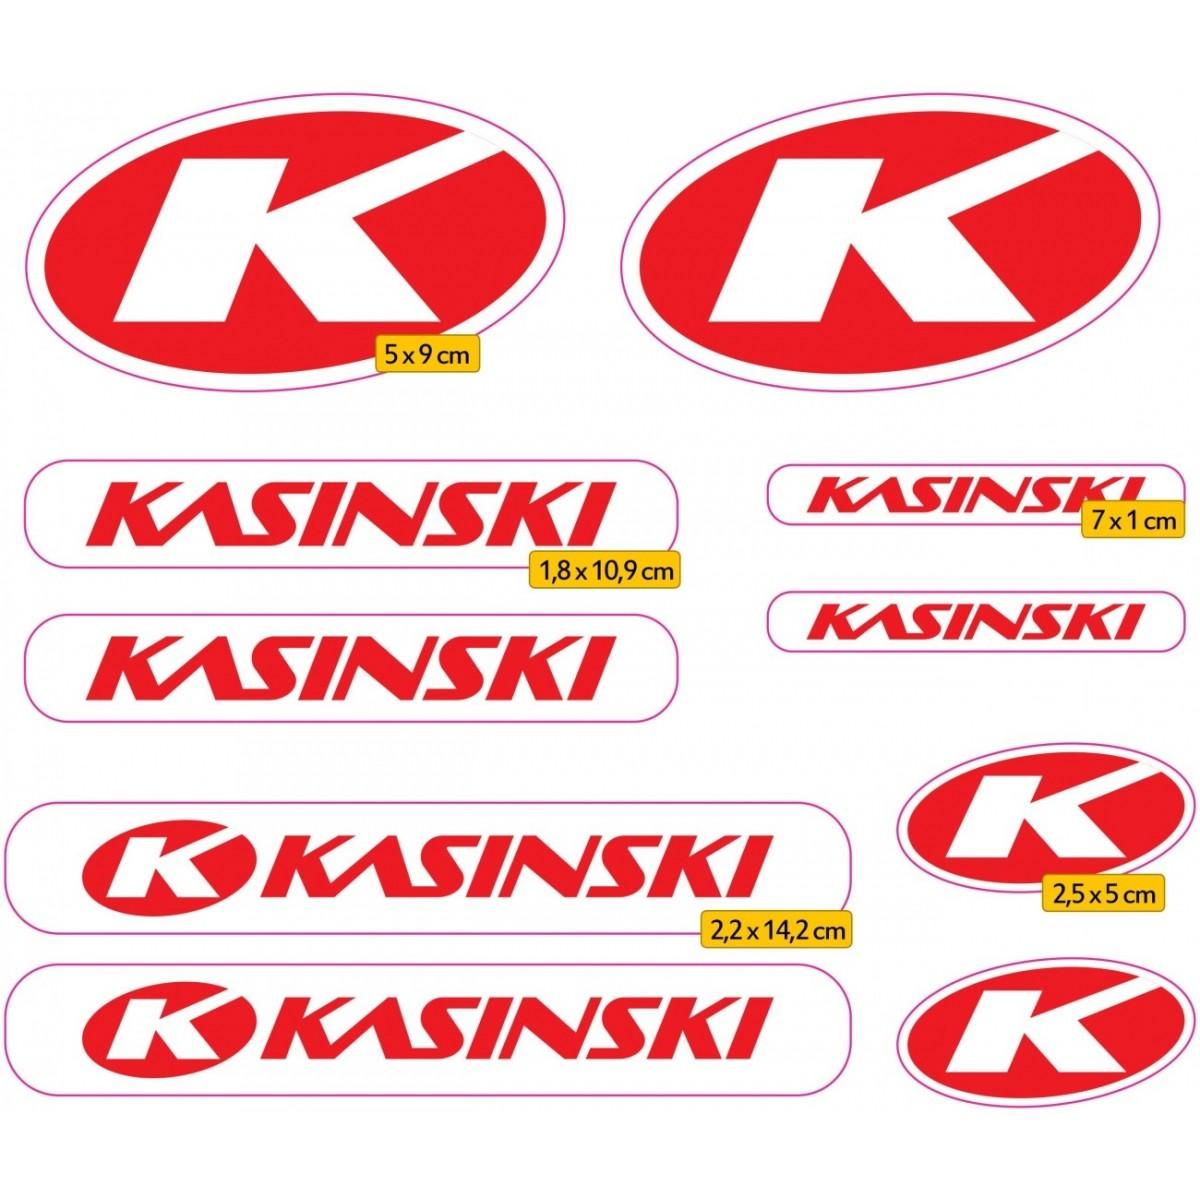 Kit Adesivos Capacete Kasinski Vermelha Refletivo Ktcp71